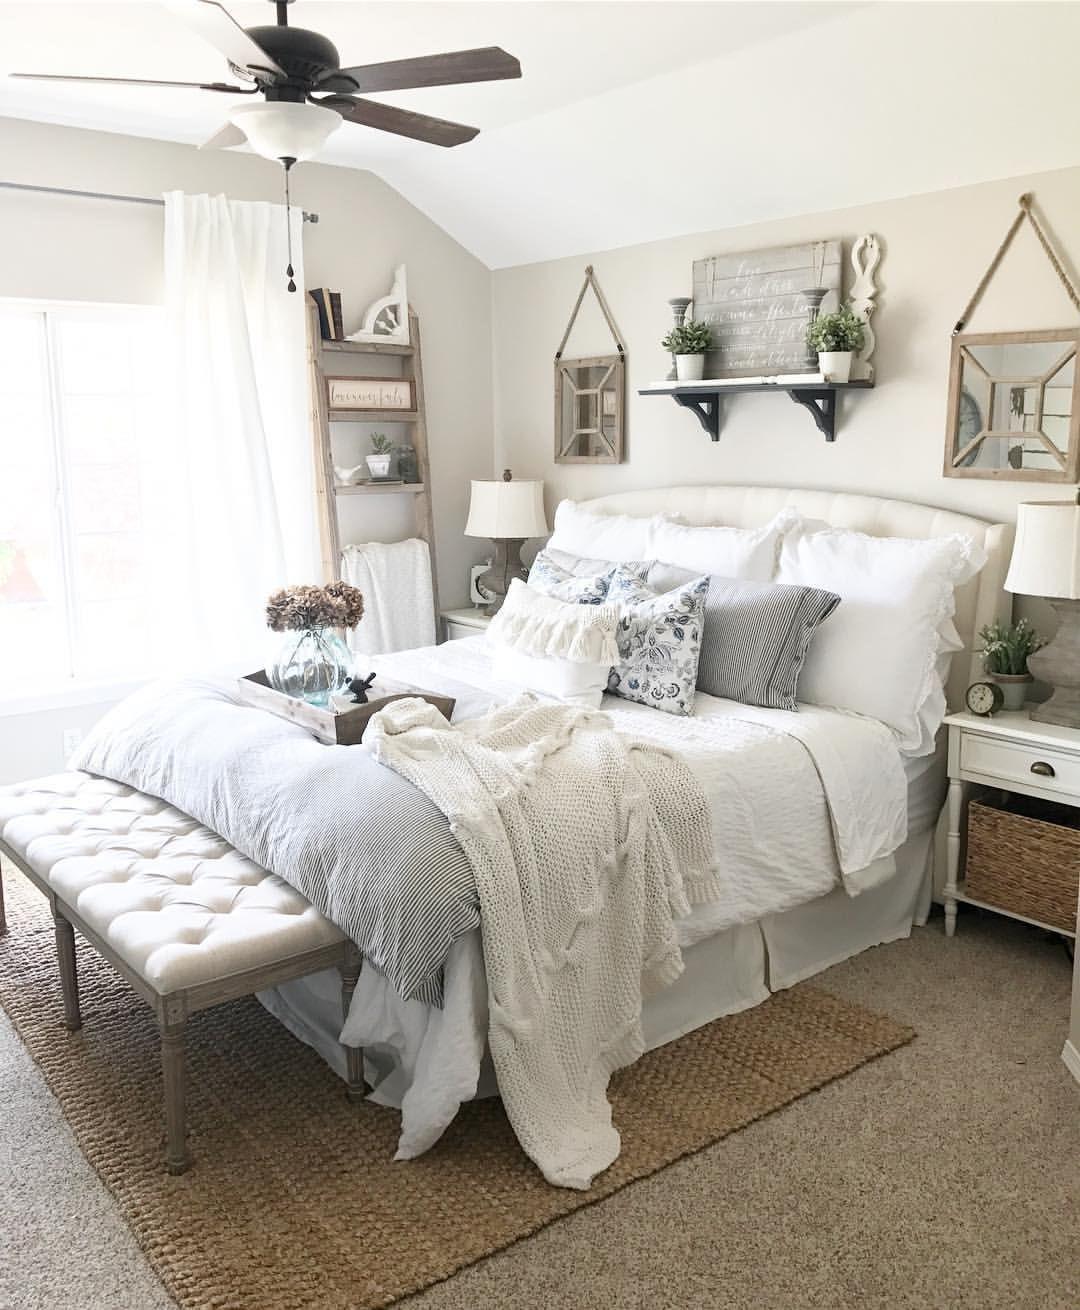 Sw modern gray walls. White comforter target, ikea striped